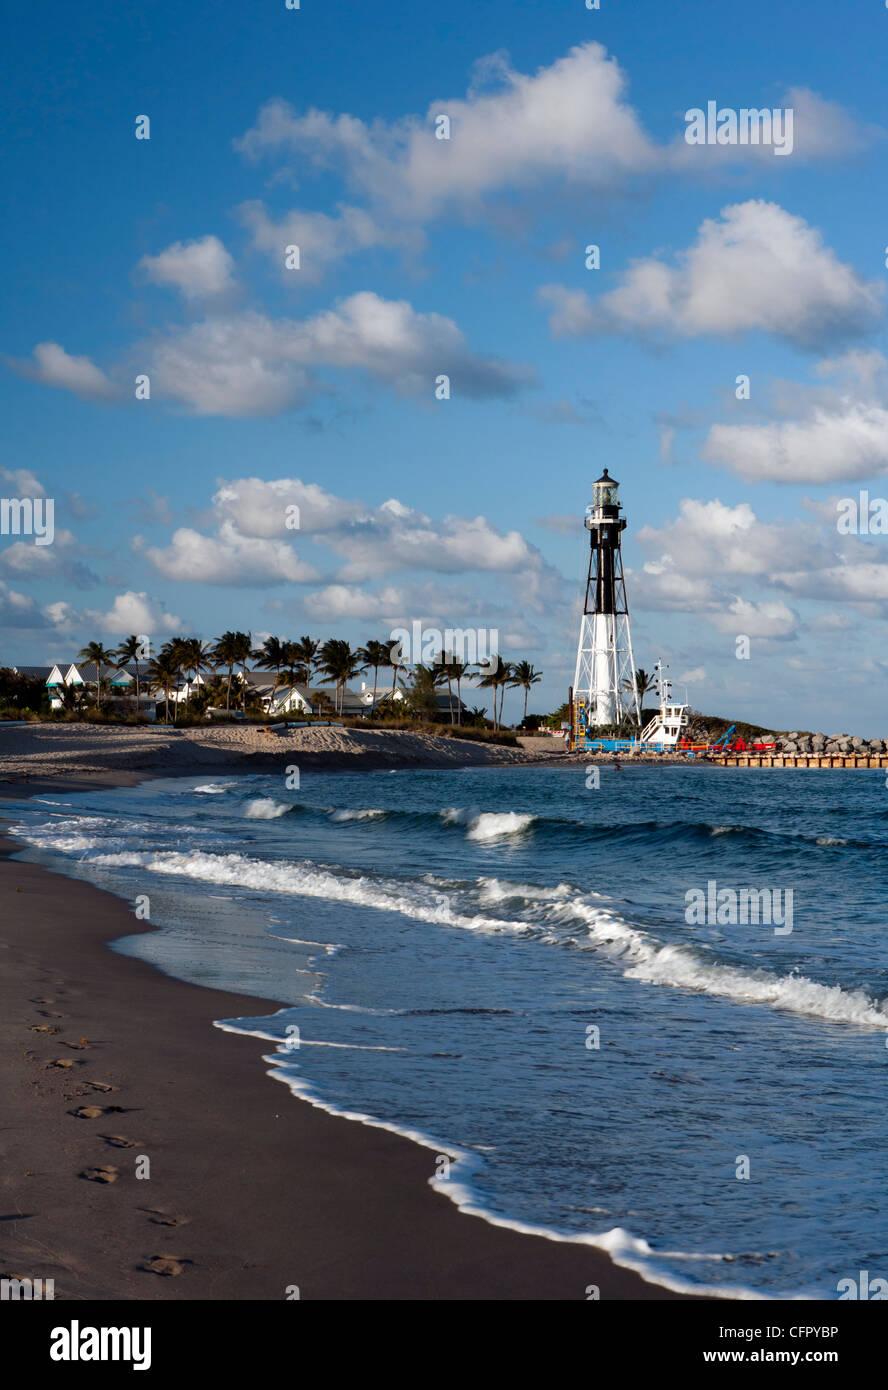 Hillsboro inlet lighthouse pompano beach florida usa stock photo hillsboro inlet lighthouse pompano beach florida usa geenschuldenfo Images